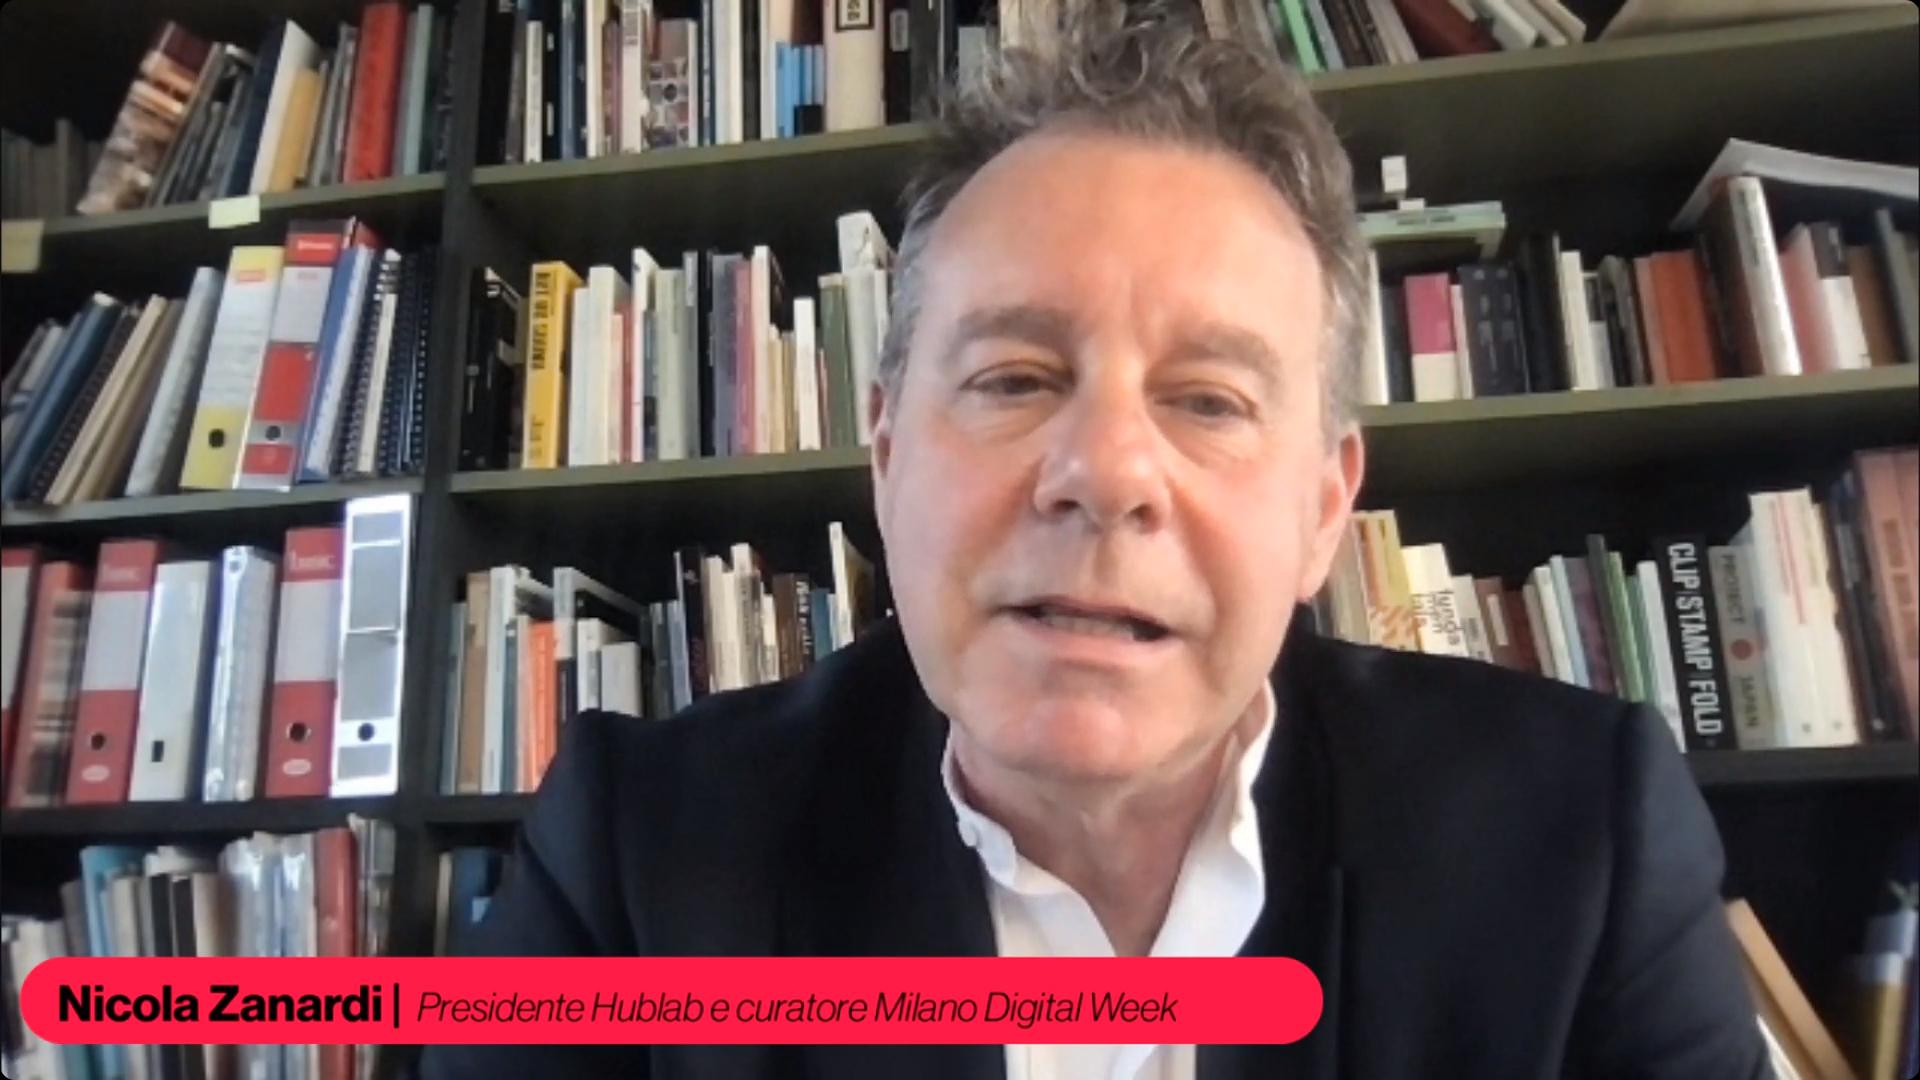 Nicola Zanardi, presidente Hublab e curatore Milano Digital Week